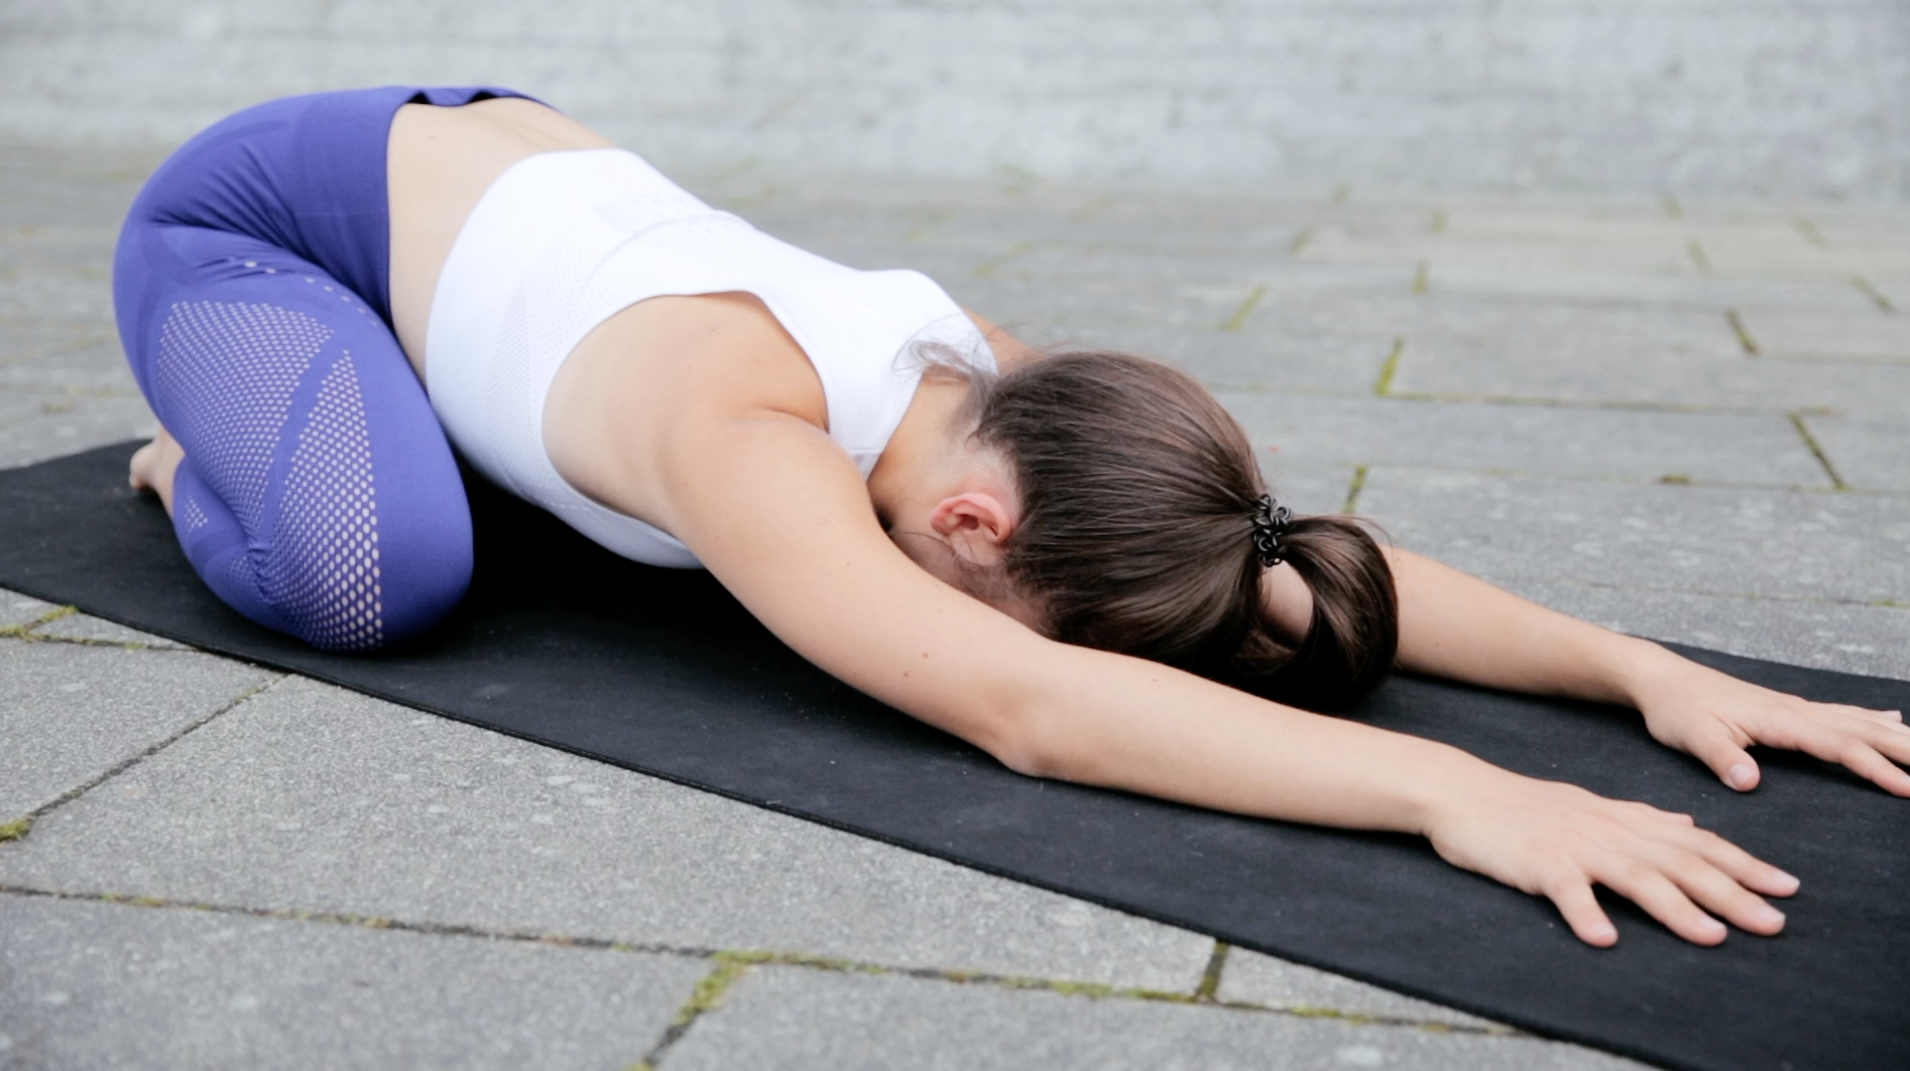 Mady-Morrison-Yoga-Detox-Flow-00002